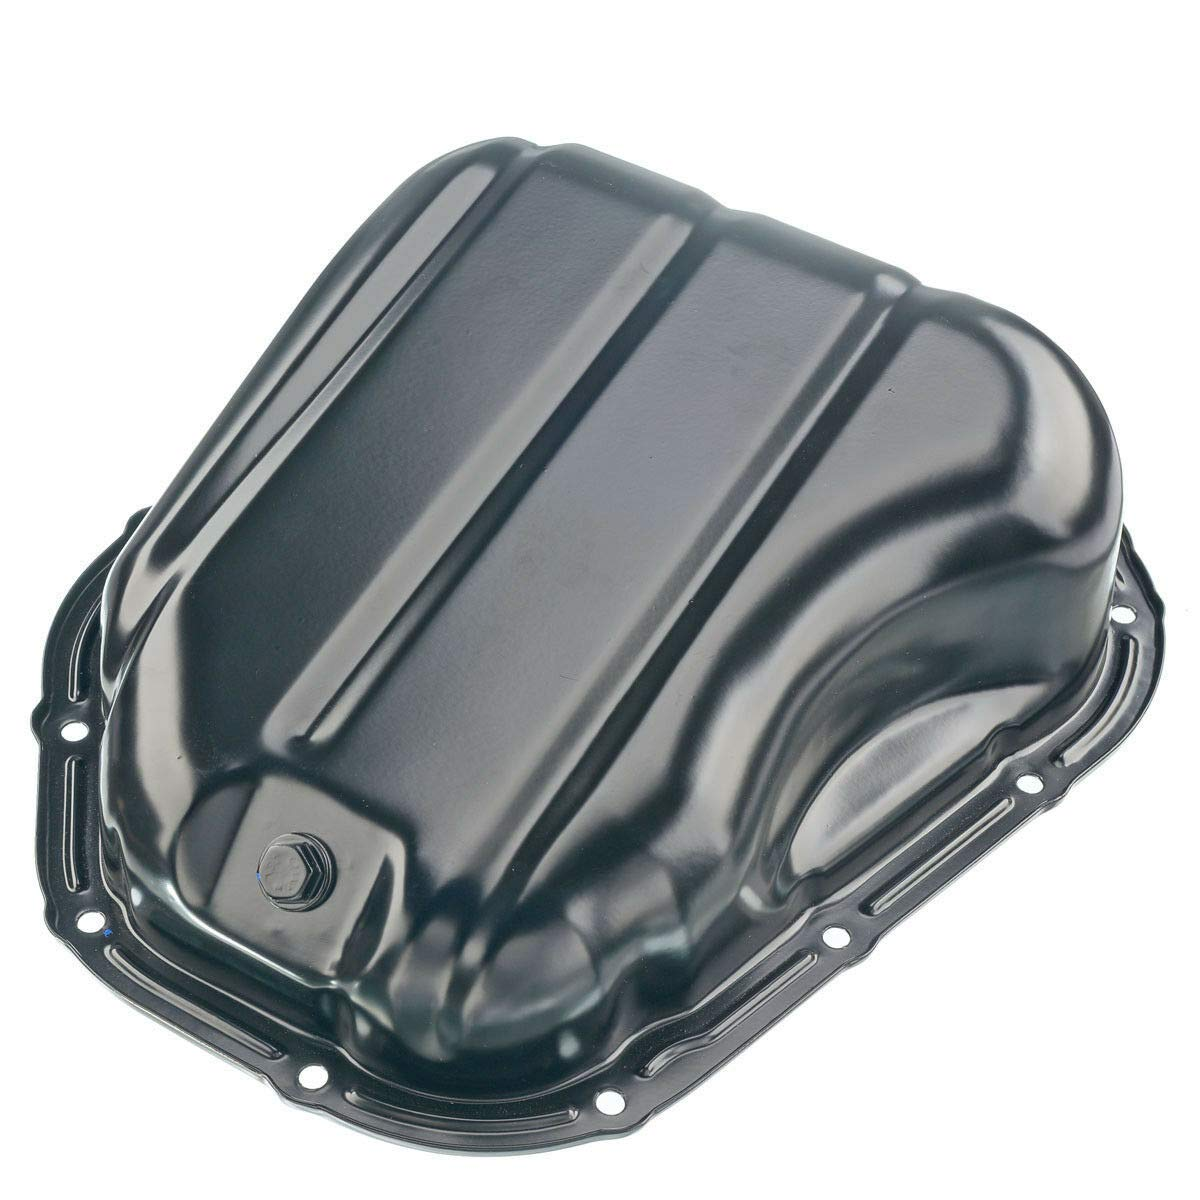 Engine Oil Pan for Toyota Camry Solara Highlander Lexus ES300 ES330 RX300 RX400h